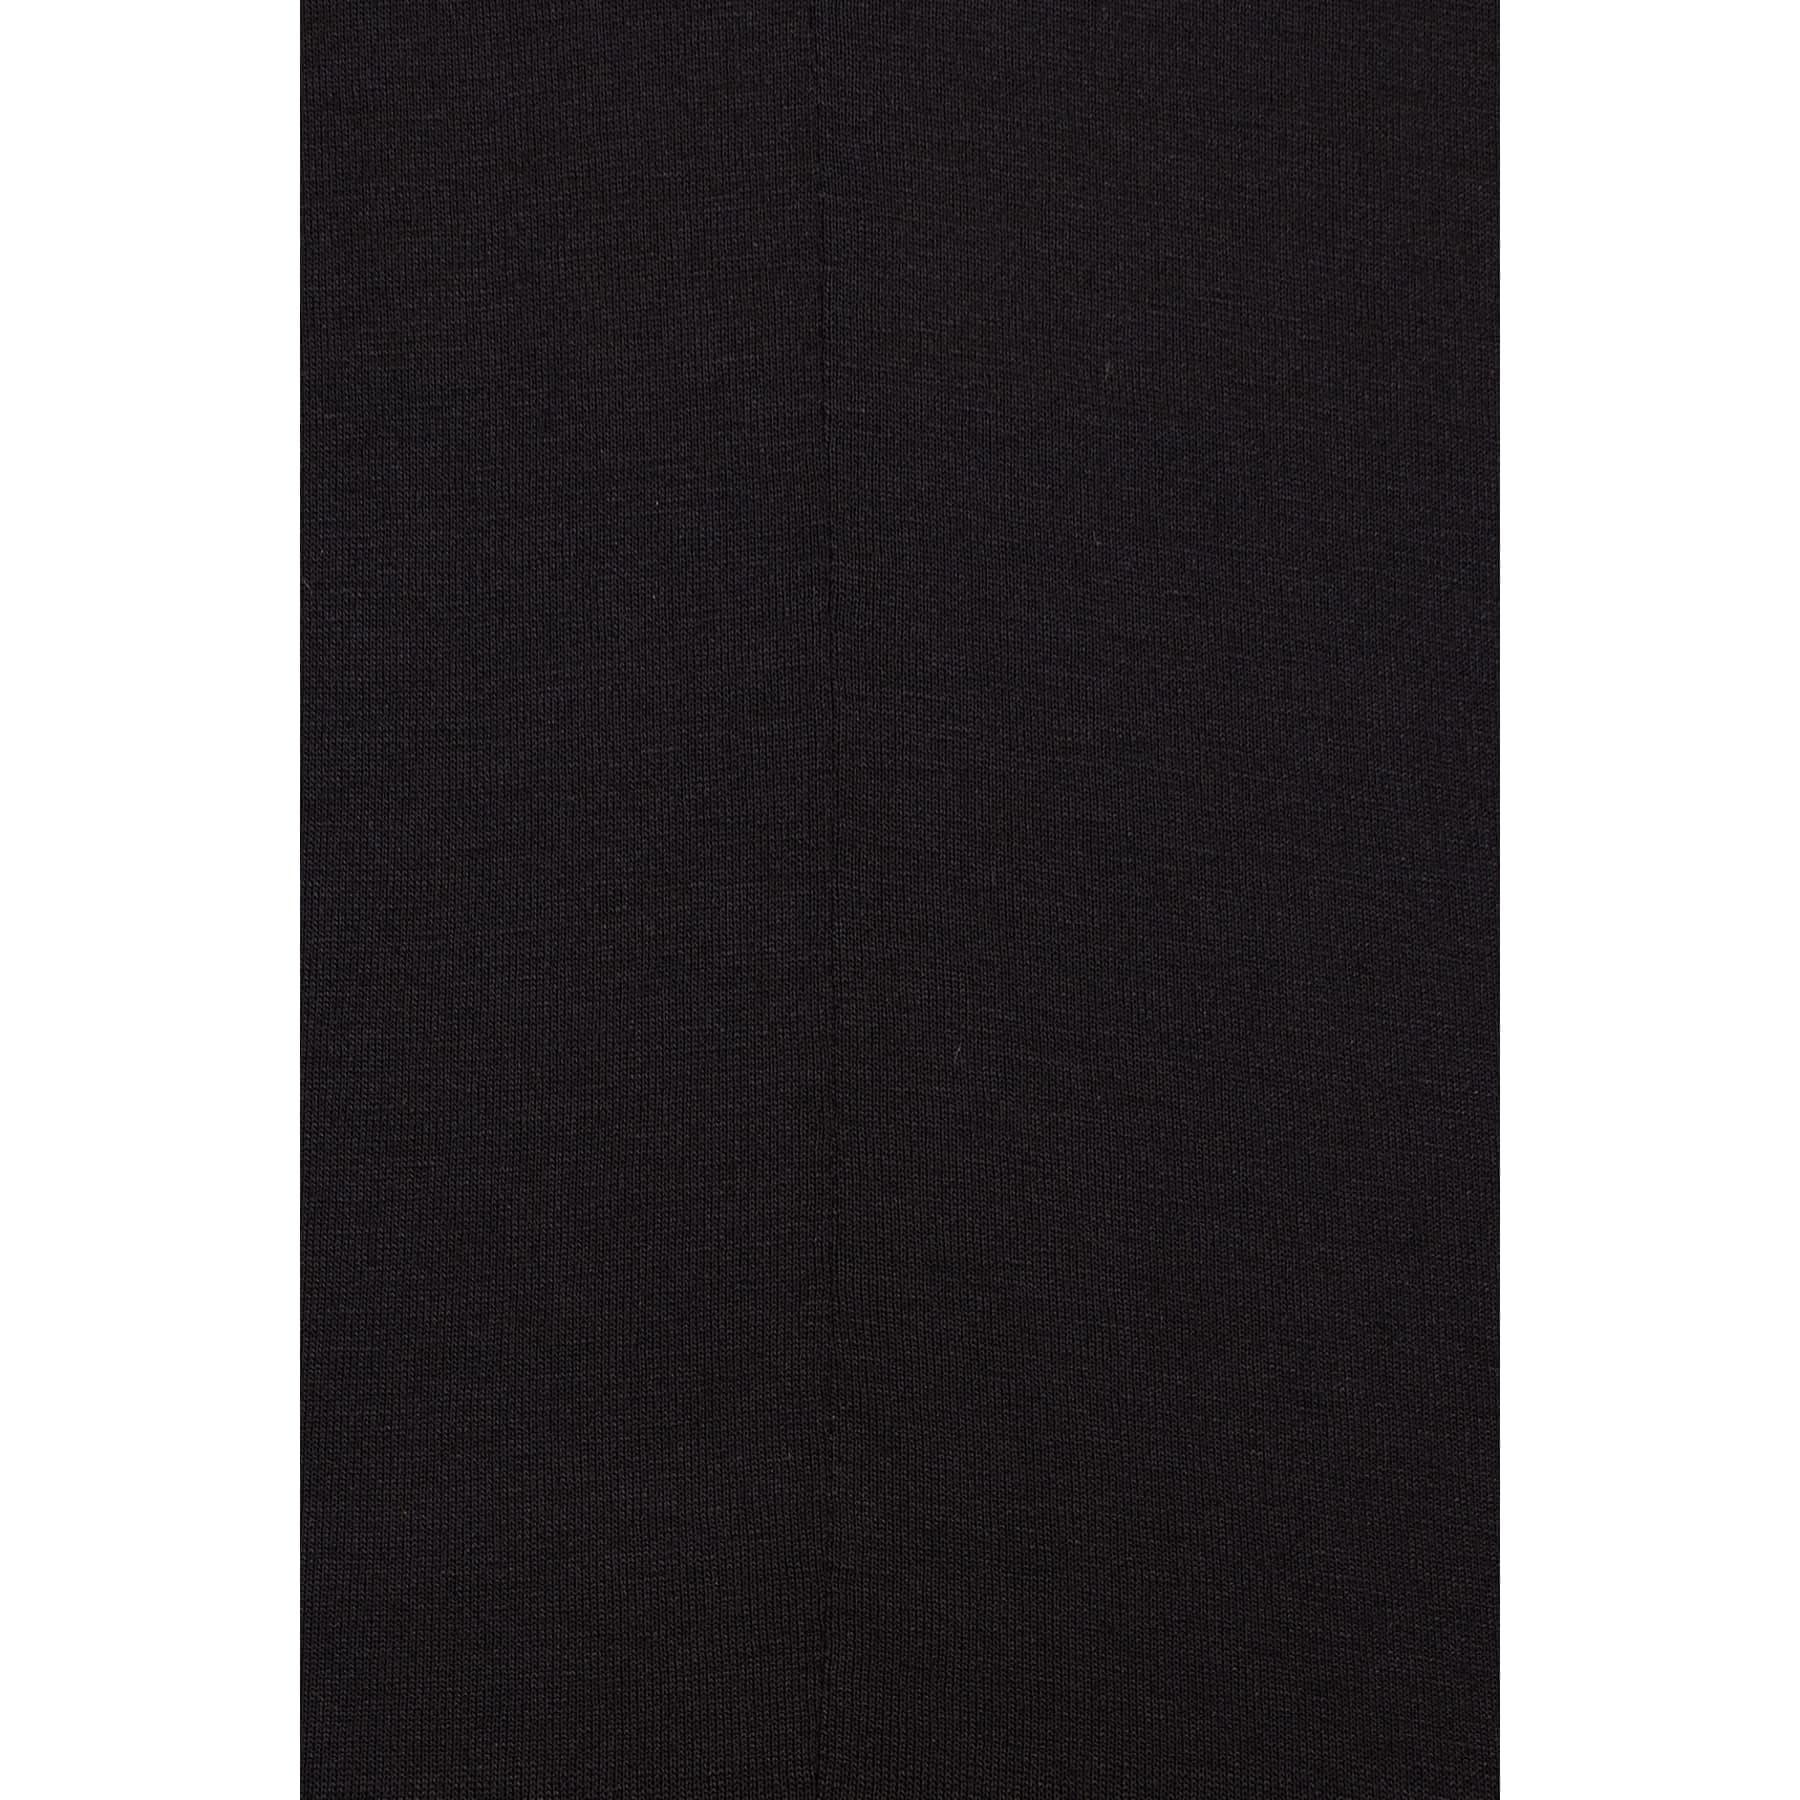 Mavi Basic V Yaka Kadın Siyah Tişört